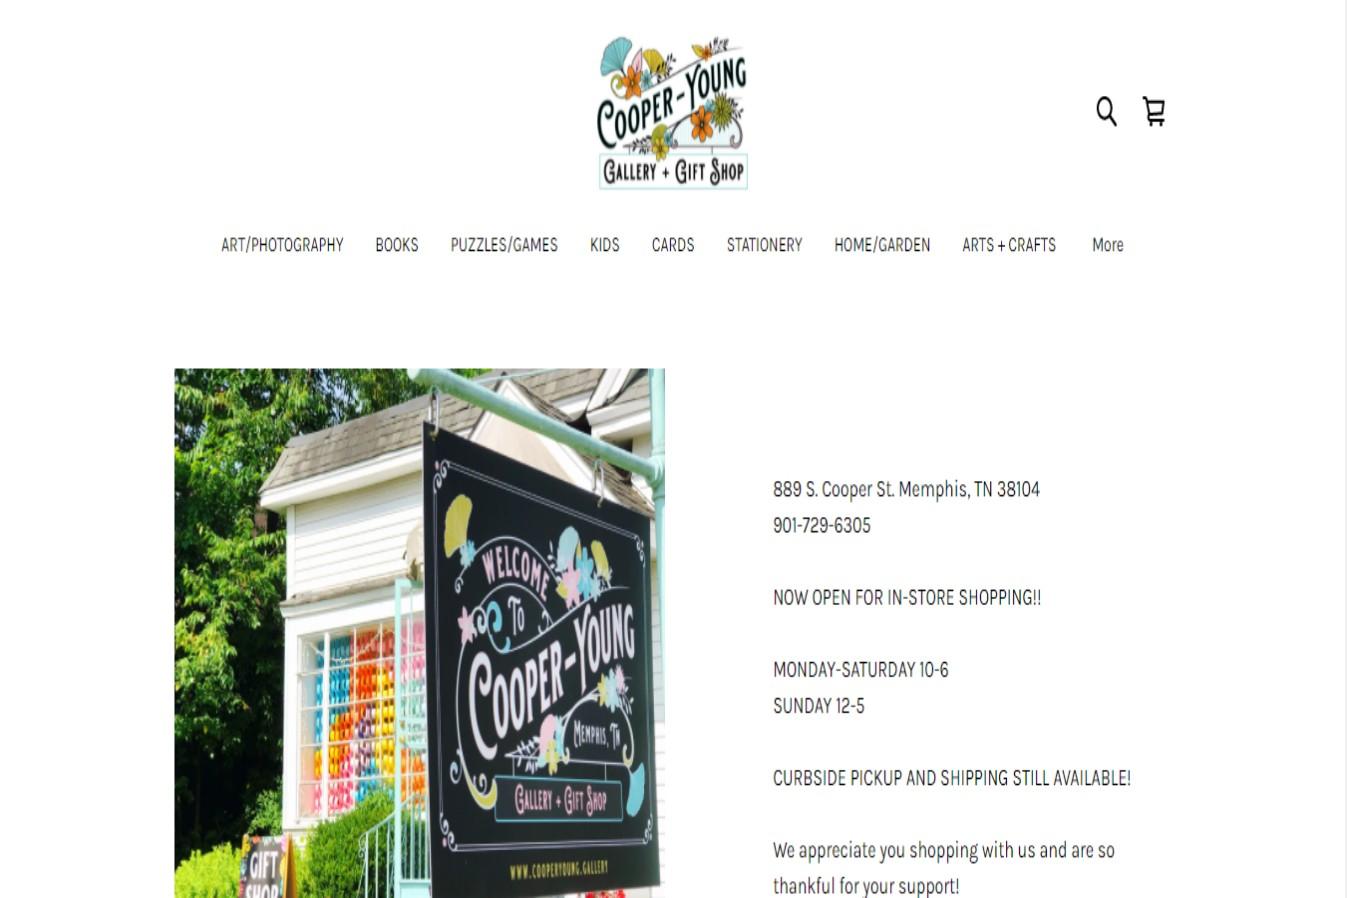 Cooper Young Best Gift Shops in Memphis, TN